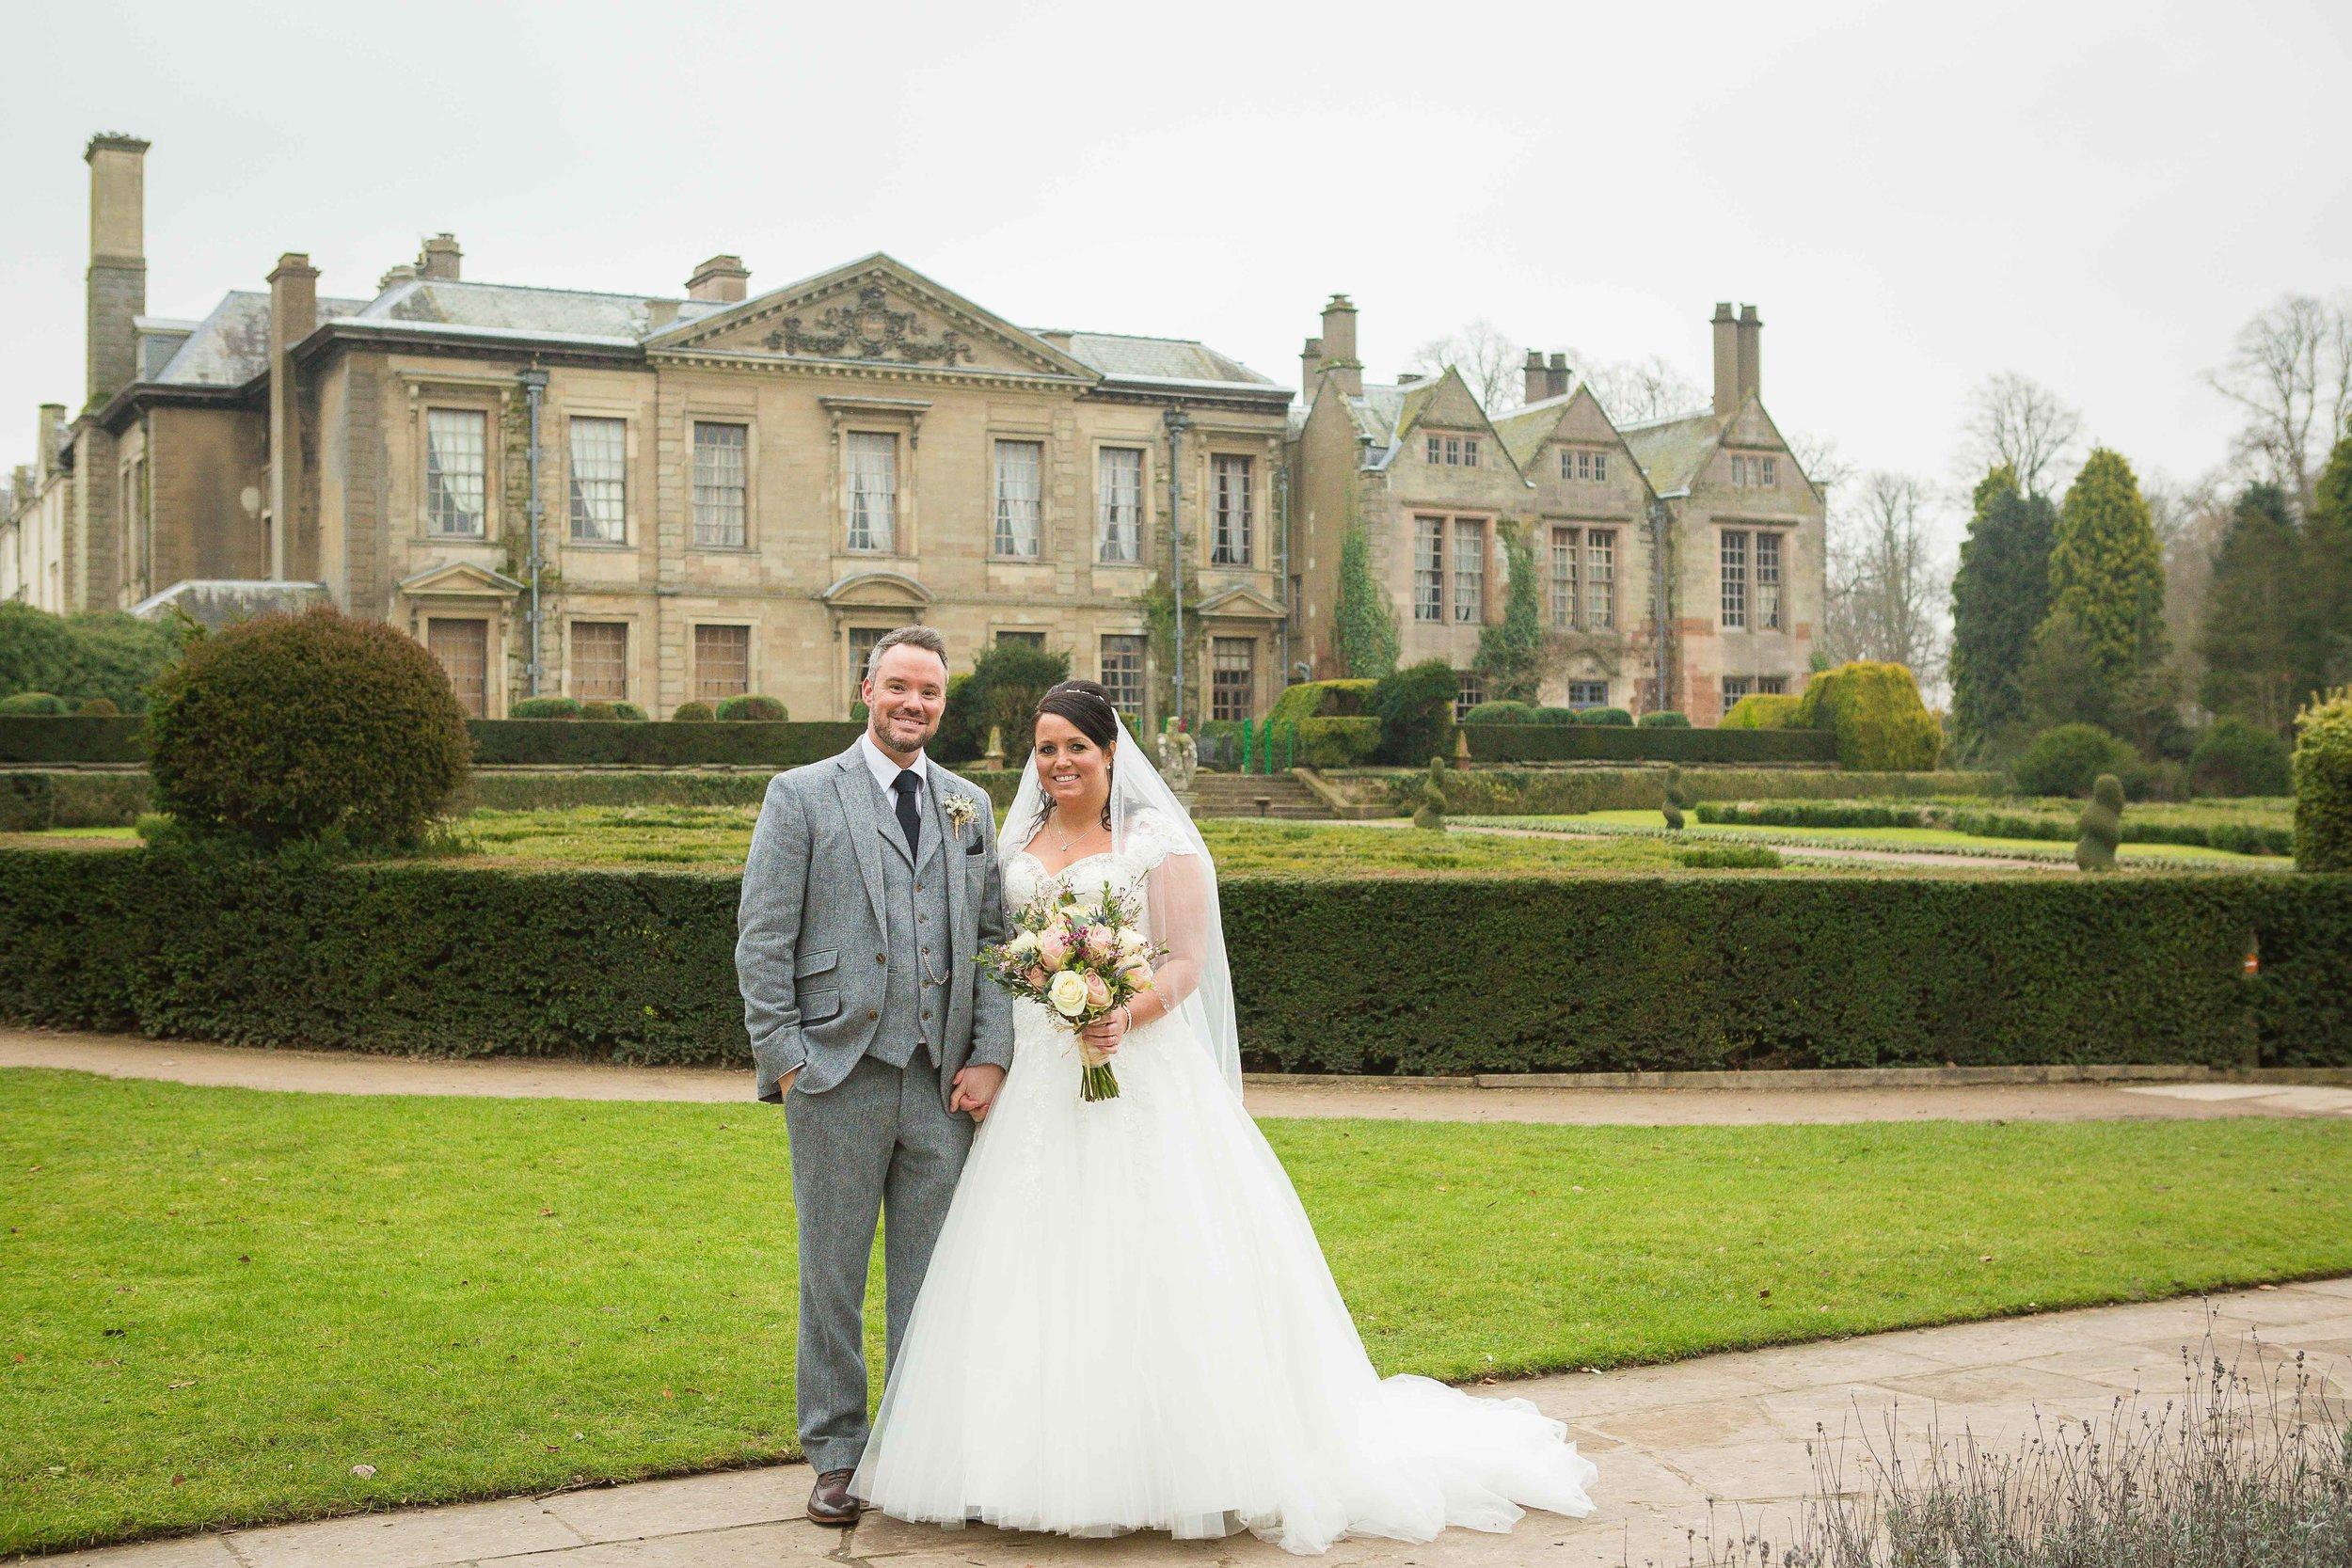 14.02.17 - Matt-Faye-Coombe-Abbey-Valentine-Wedding-Charnwood-Photography-1061.jpg